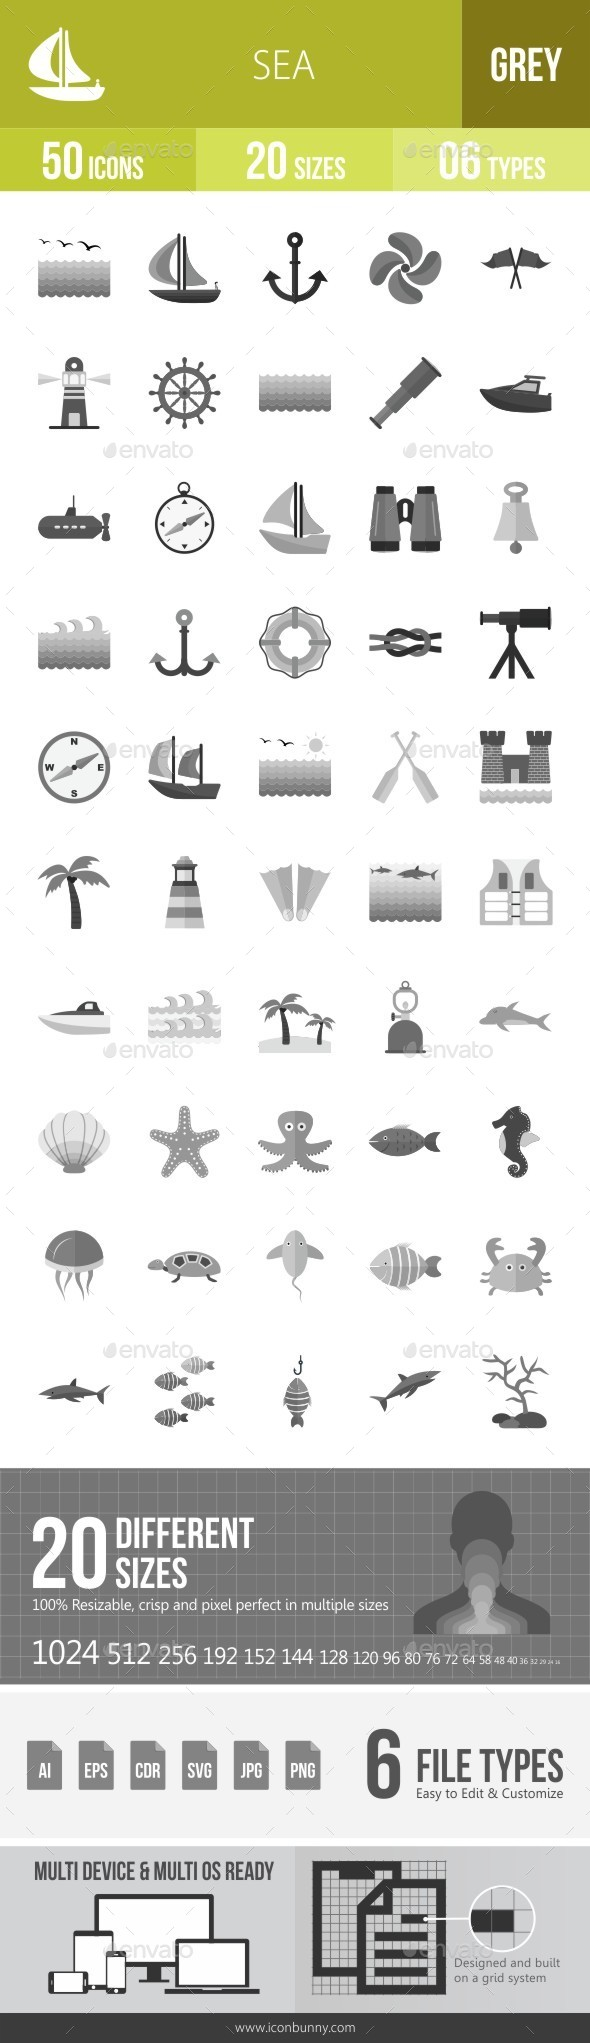 Sea Greyscale Icons - Icons